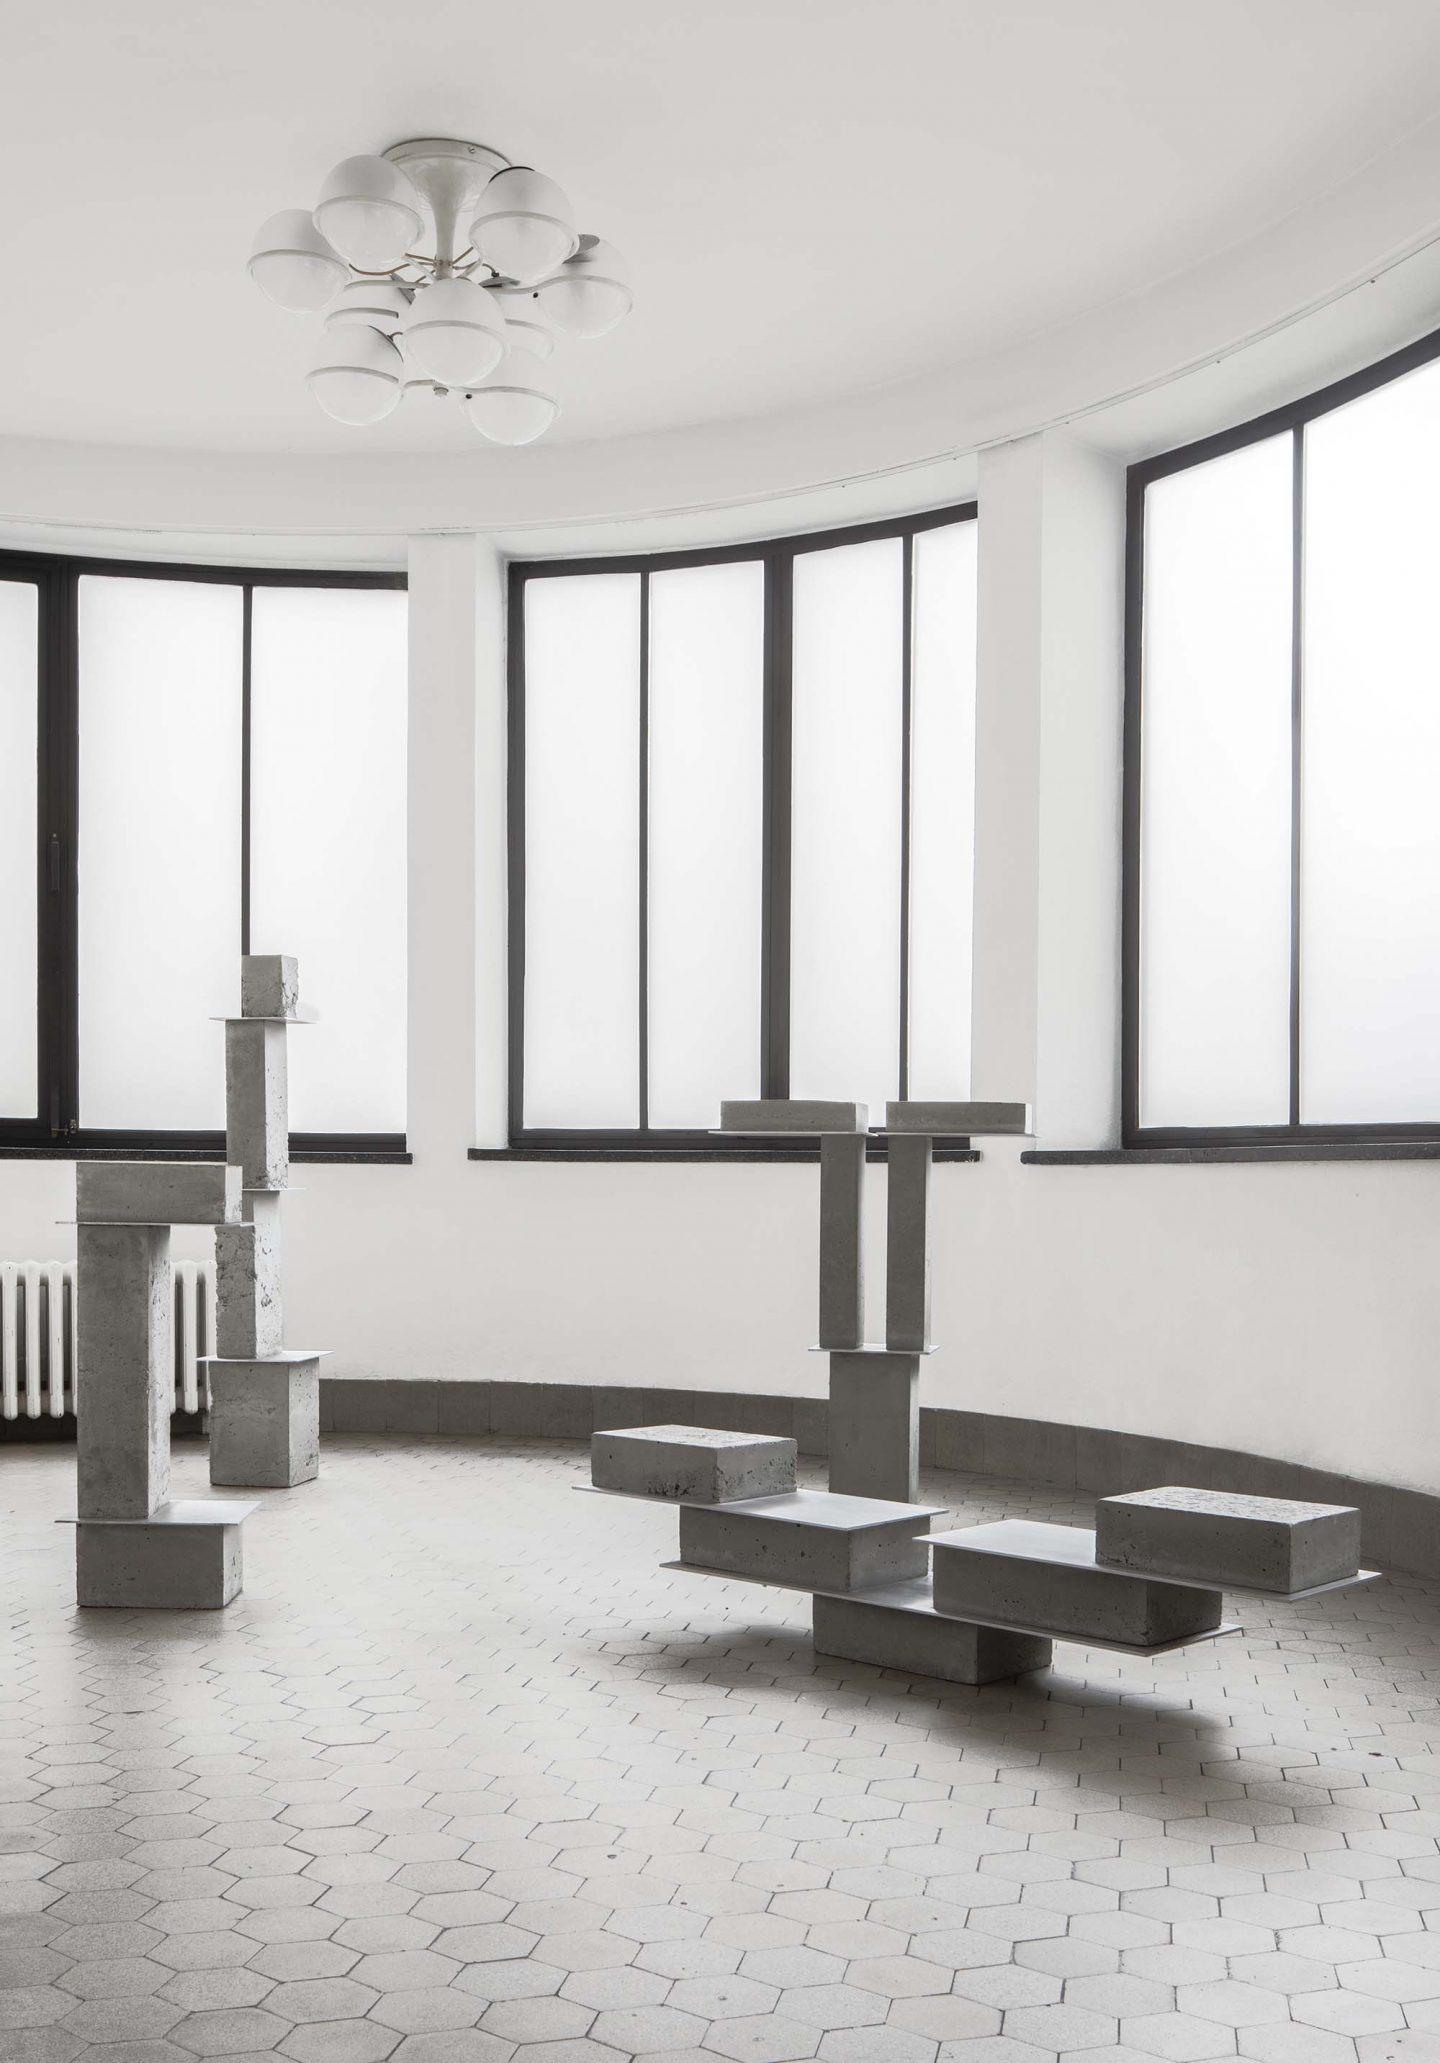 IGNANT-Design-Bram-Vanderbeke-36